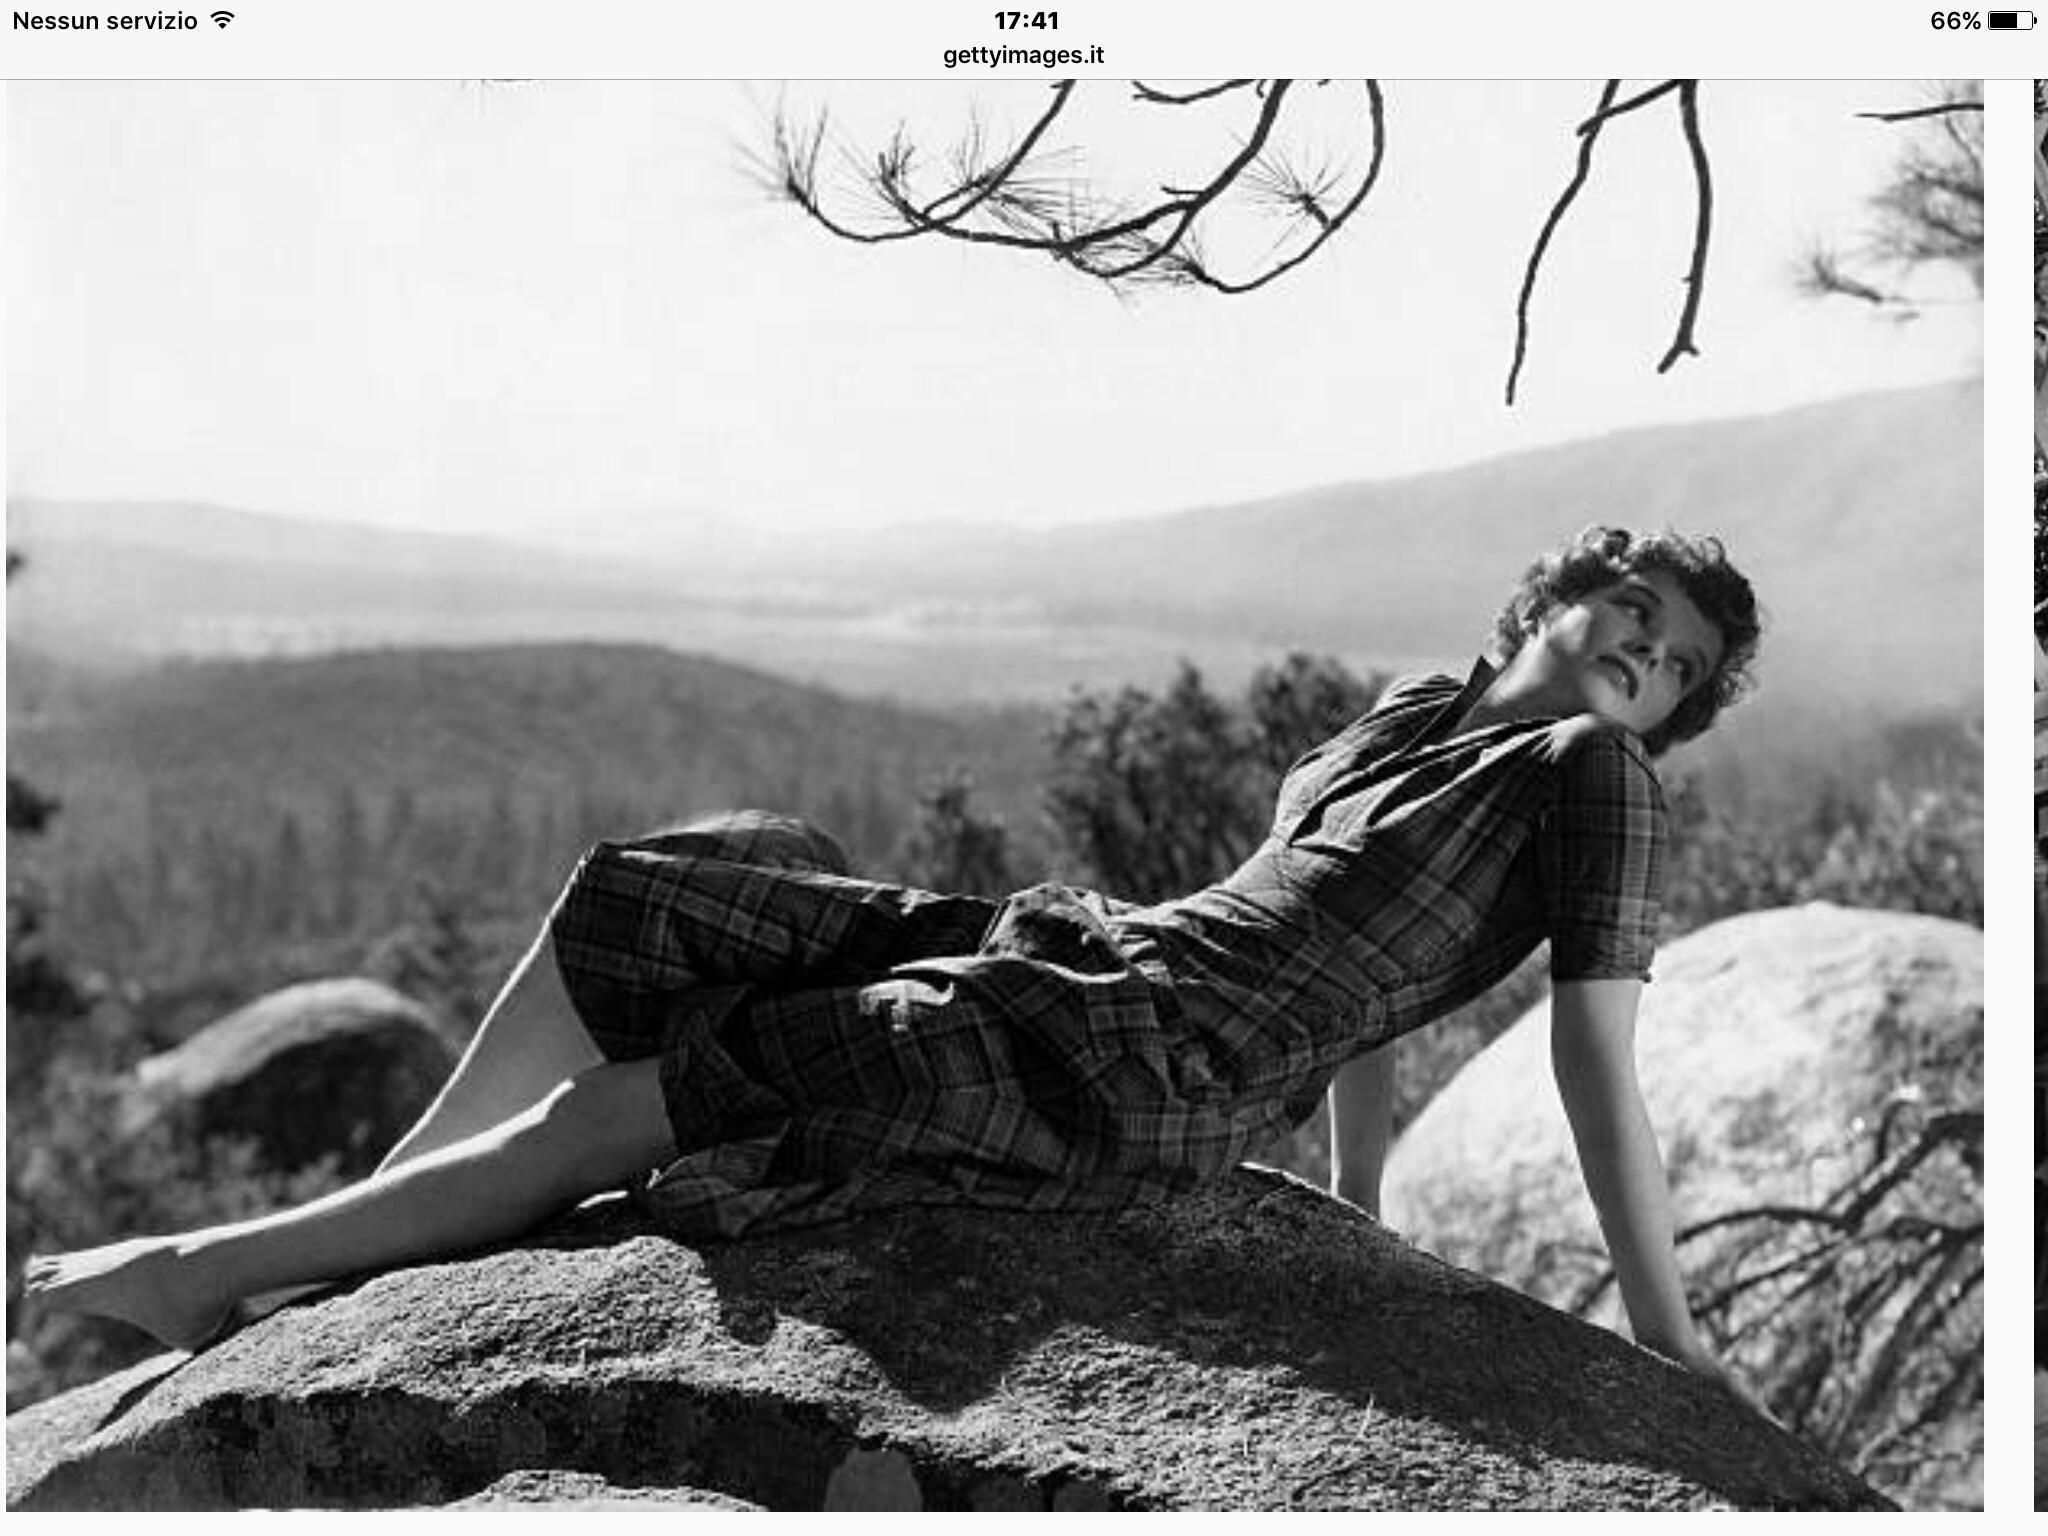 https://pics.wikifeet.com/Katharine-Hepburn-Feet-2962165.jpg